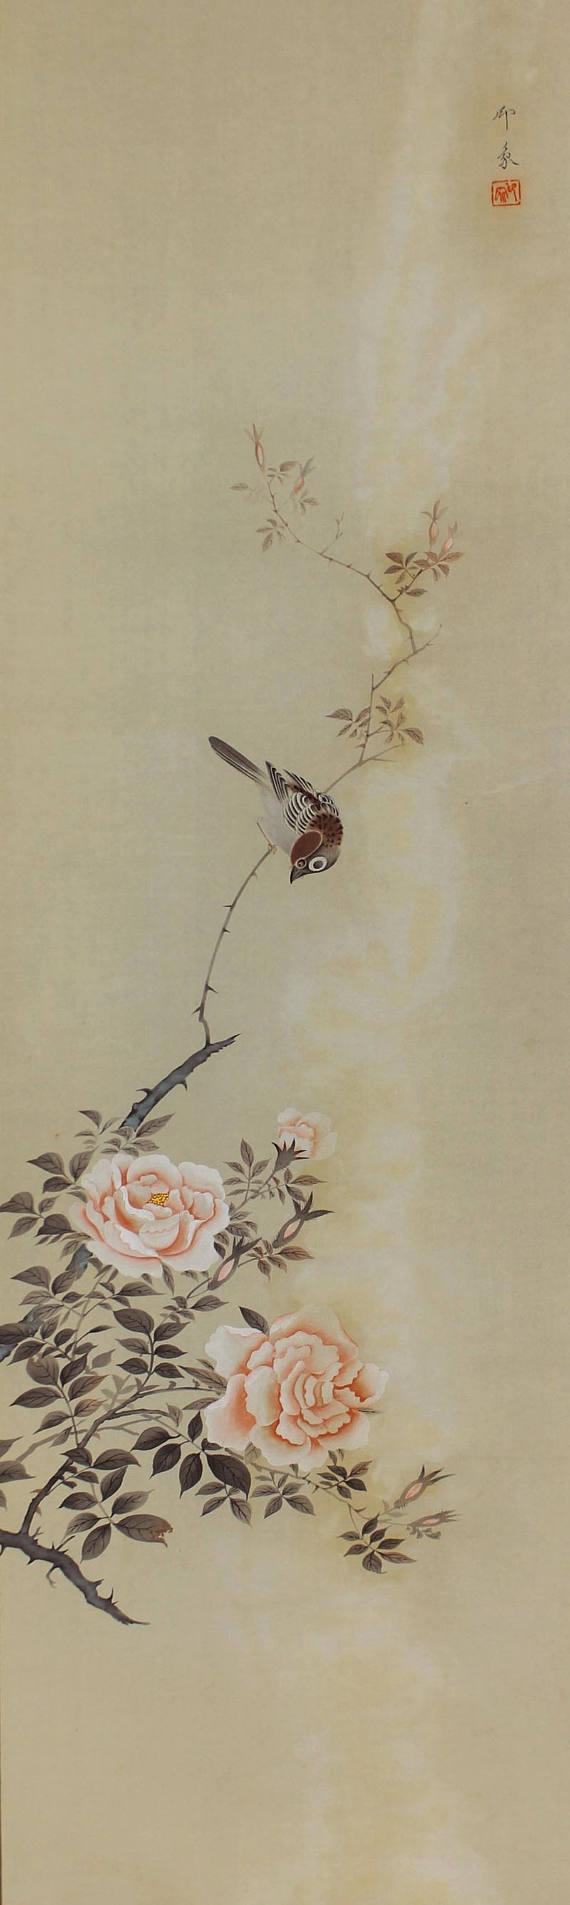 Sparrow on Rose. Bird and Flower Hanging scroll painting,Japanese Art Kakejiku